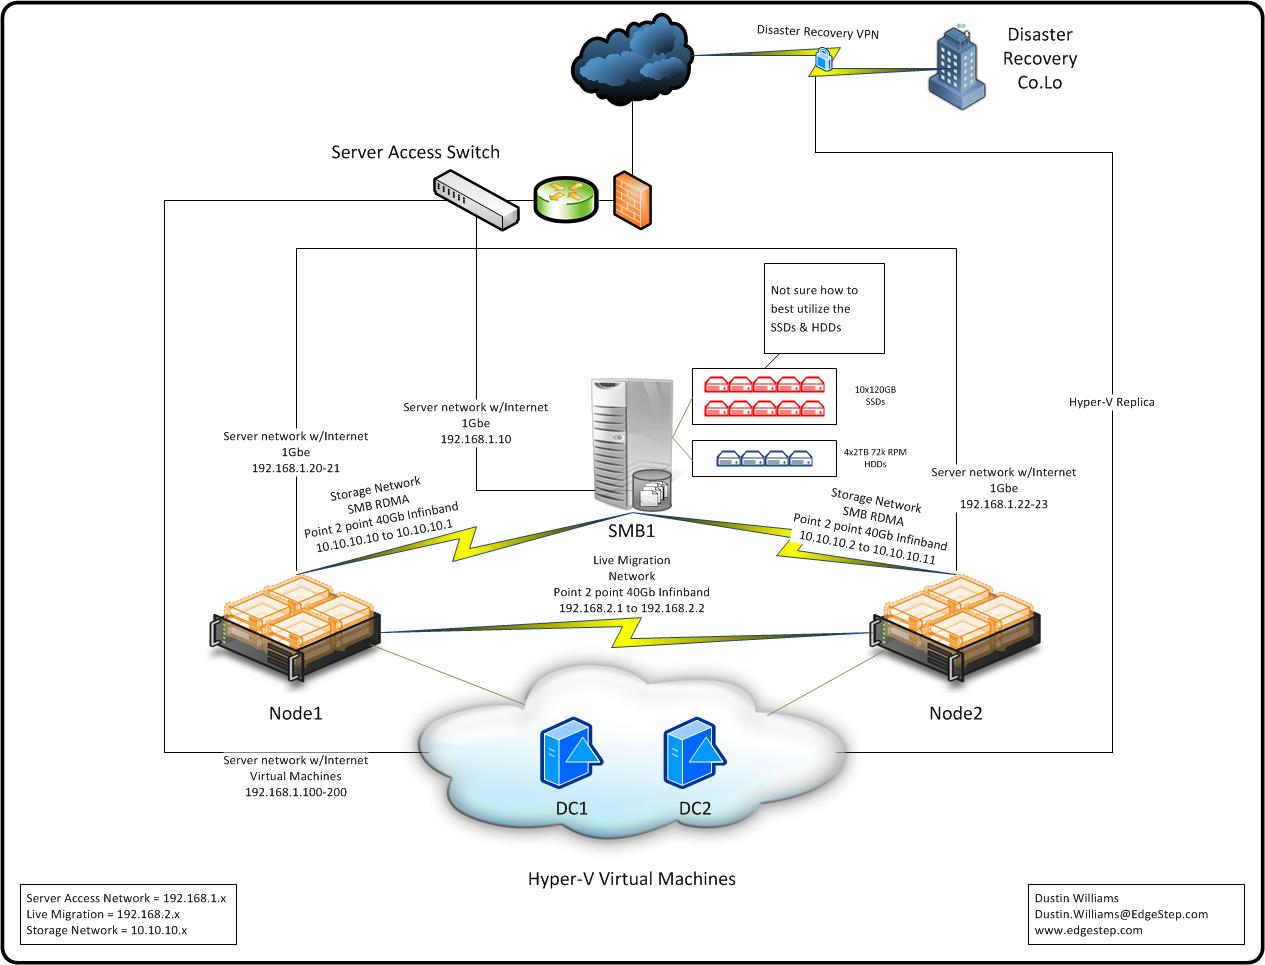 hyper v cluster using smb having problems with live migration rh social technet microsoft com Hyper-V Cluster Architecture Hyper-V Cluster Maximum Nodes